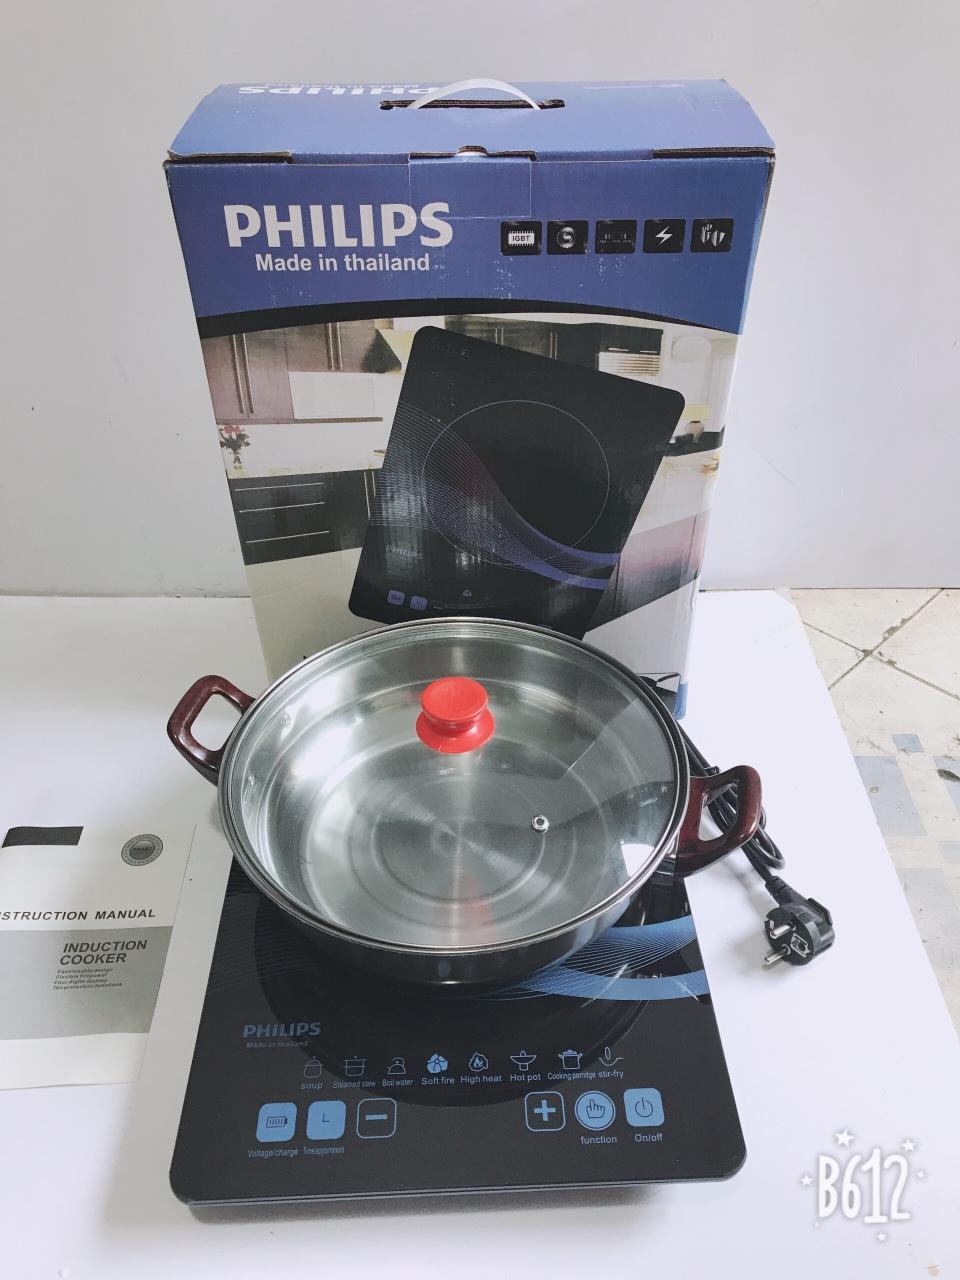 Bếp điện từ cảm ứng PHILIPS PL-01 (MADE IN THAILAND) tặng nồi INOX ( SALE )